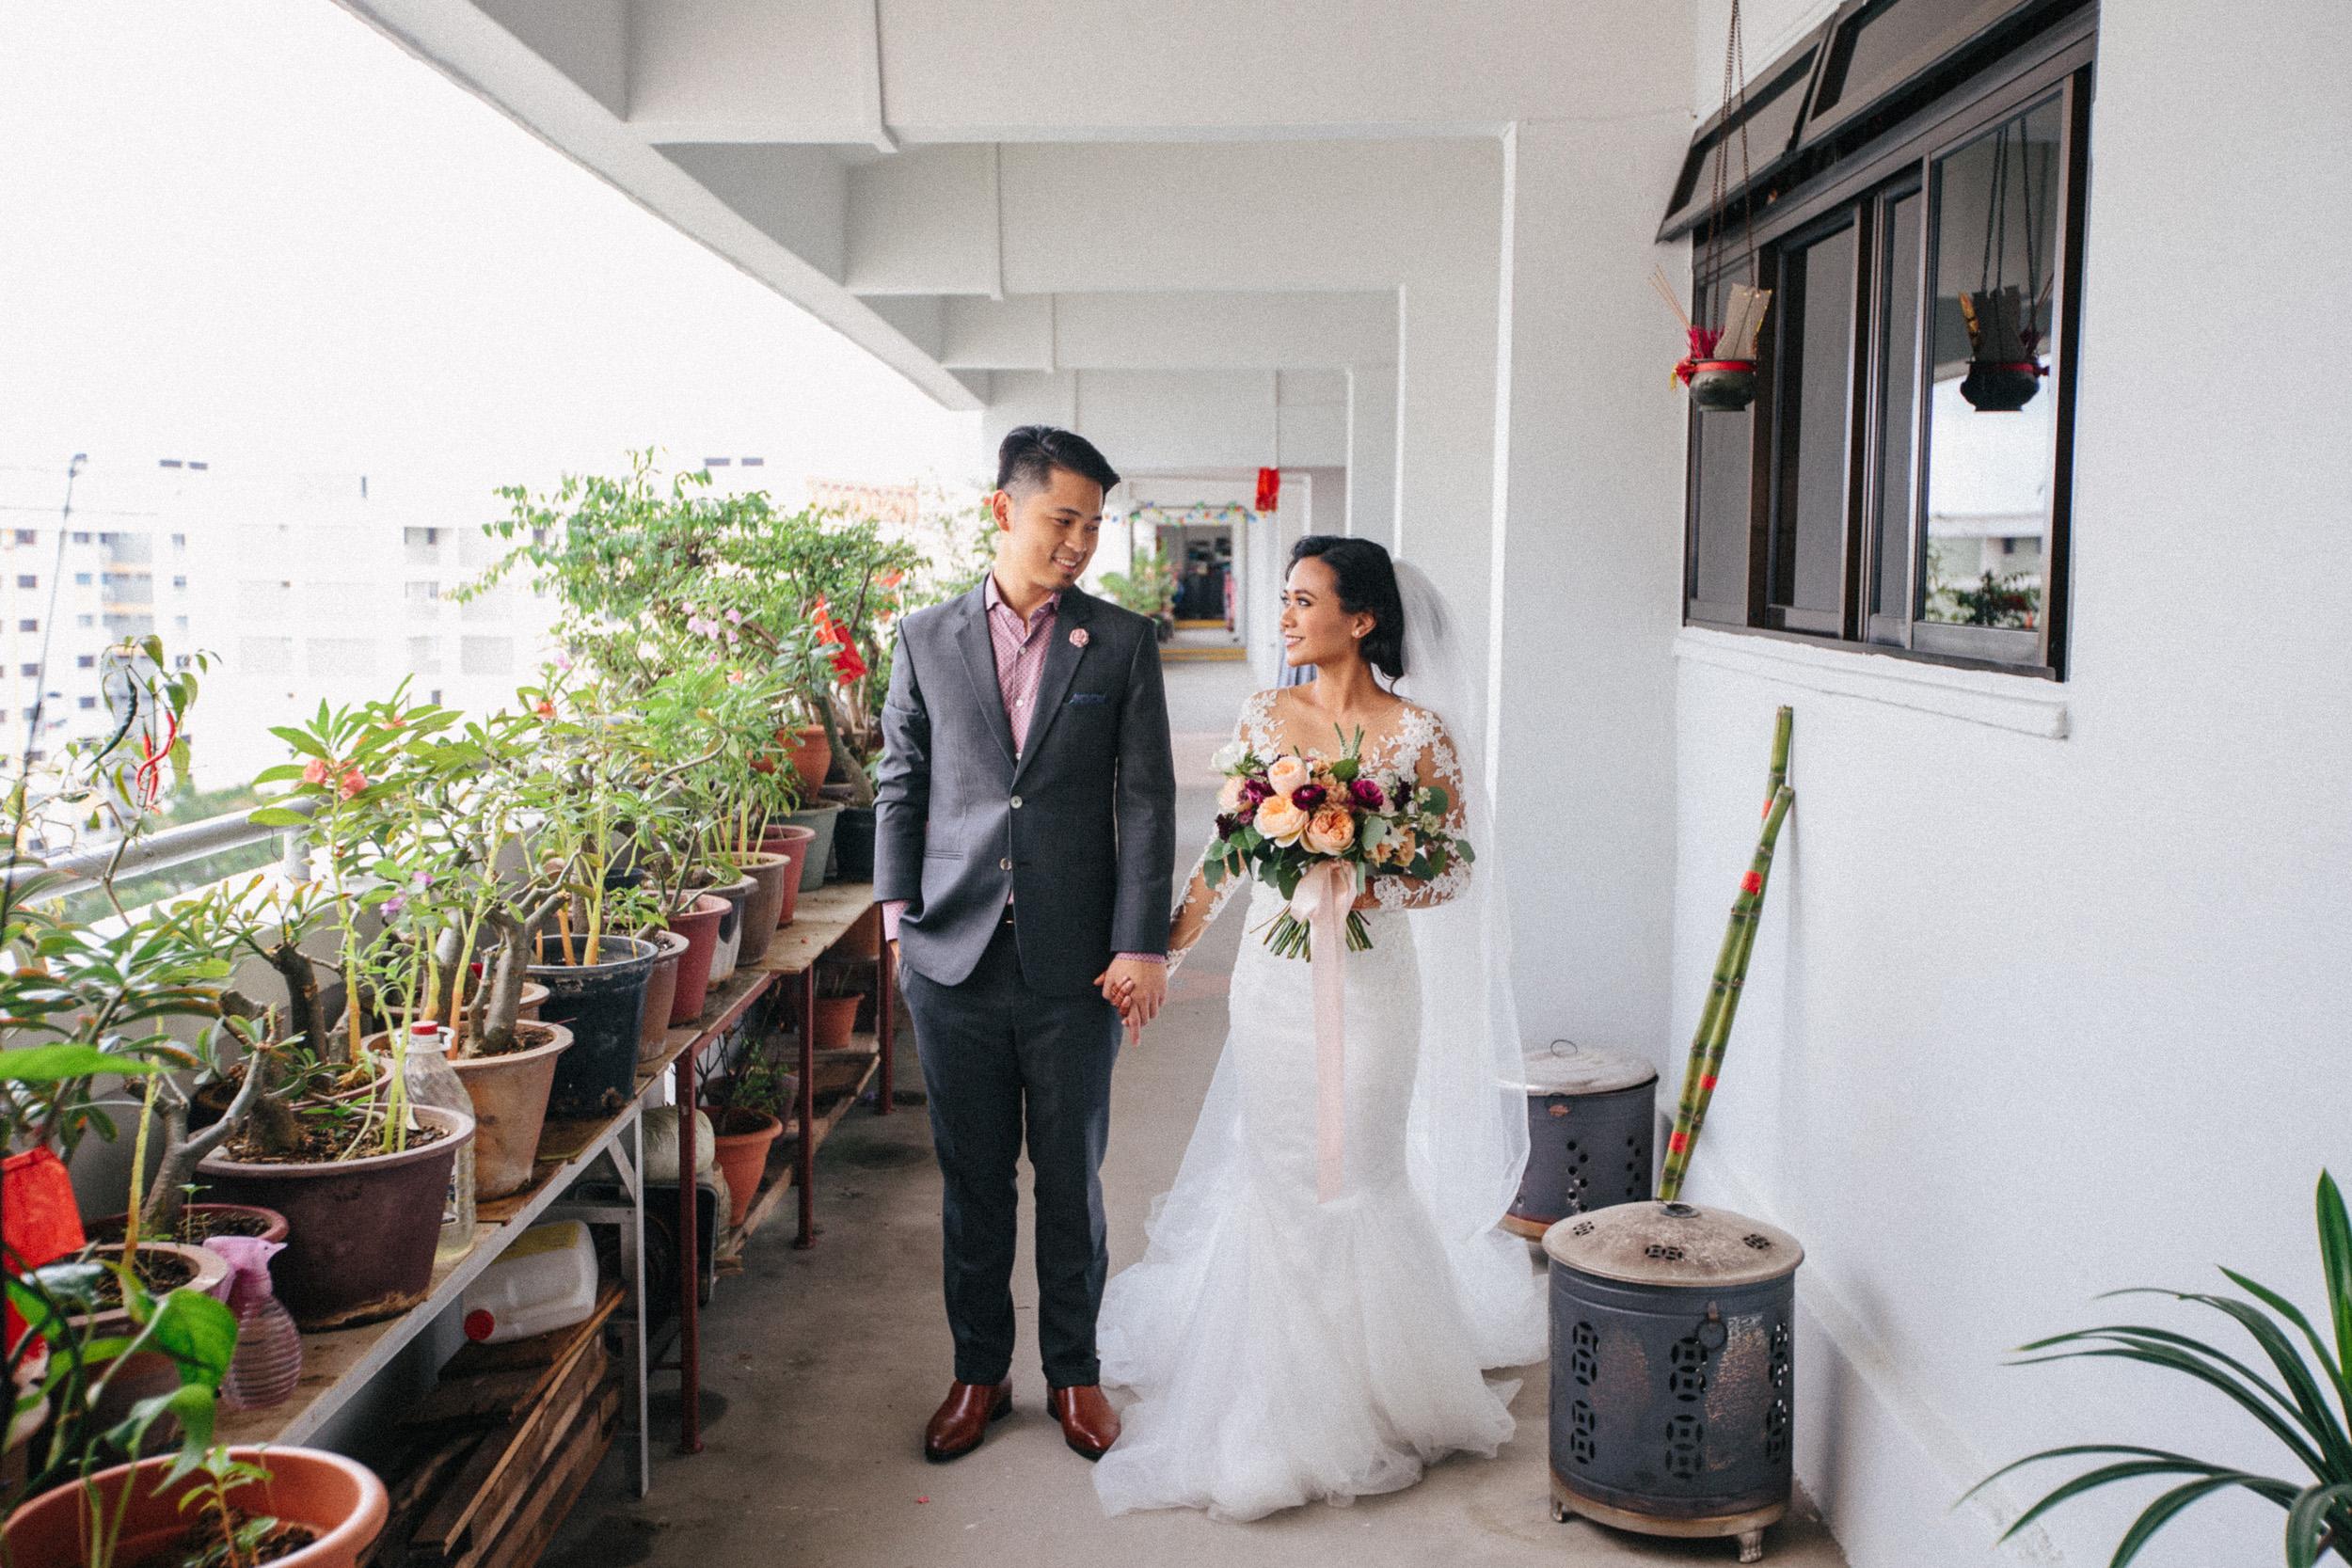 singapore-wedding-photographer-photography-wmt2017-033.jpg